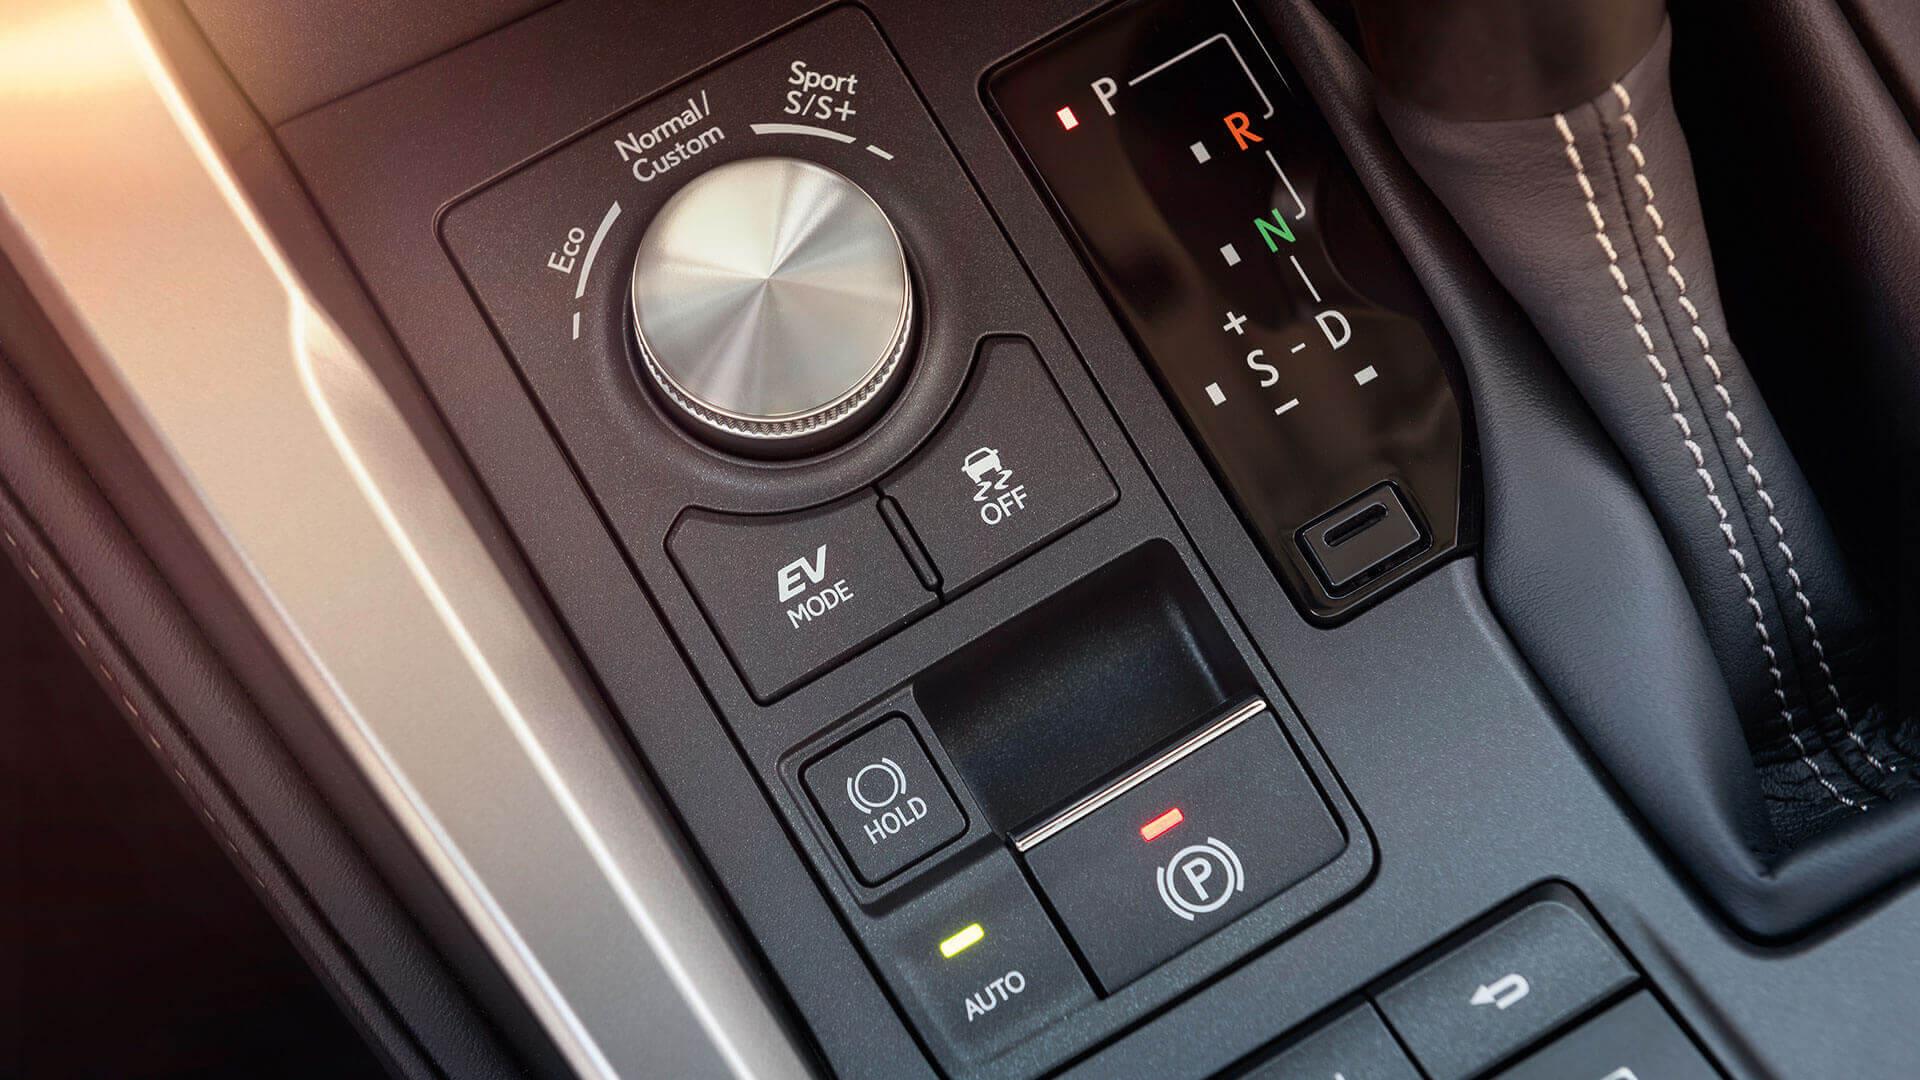 Bedieningspaneel van een Lexus NX 300h